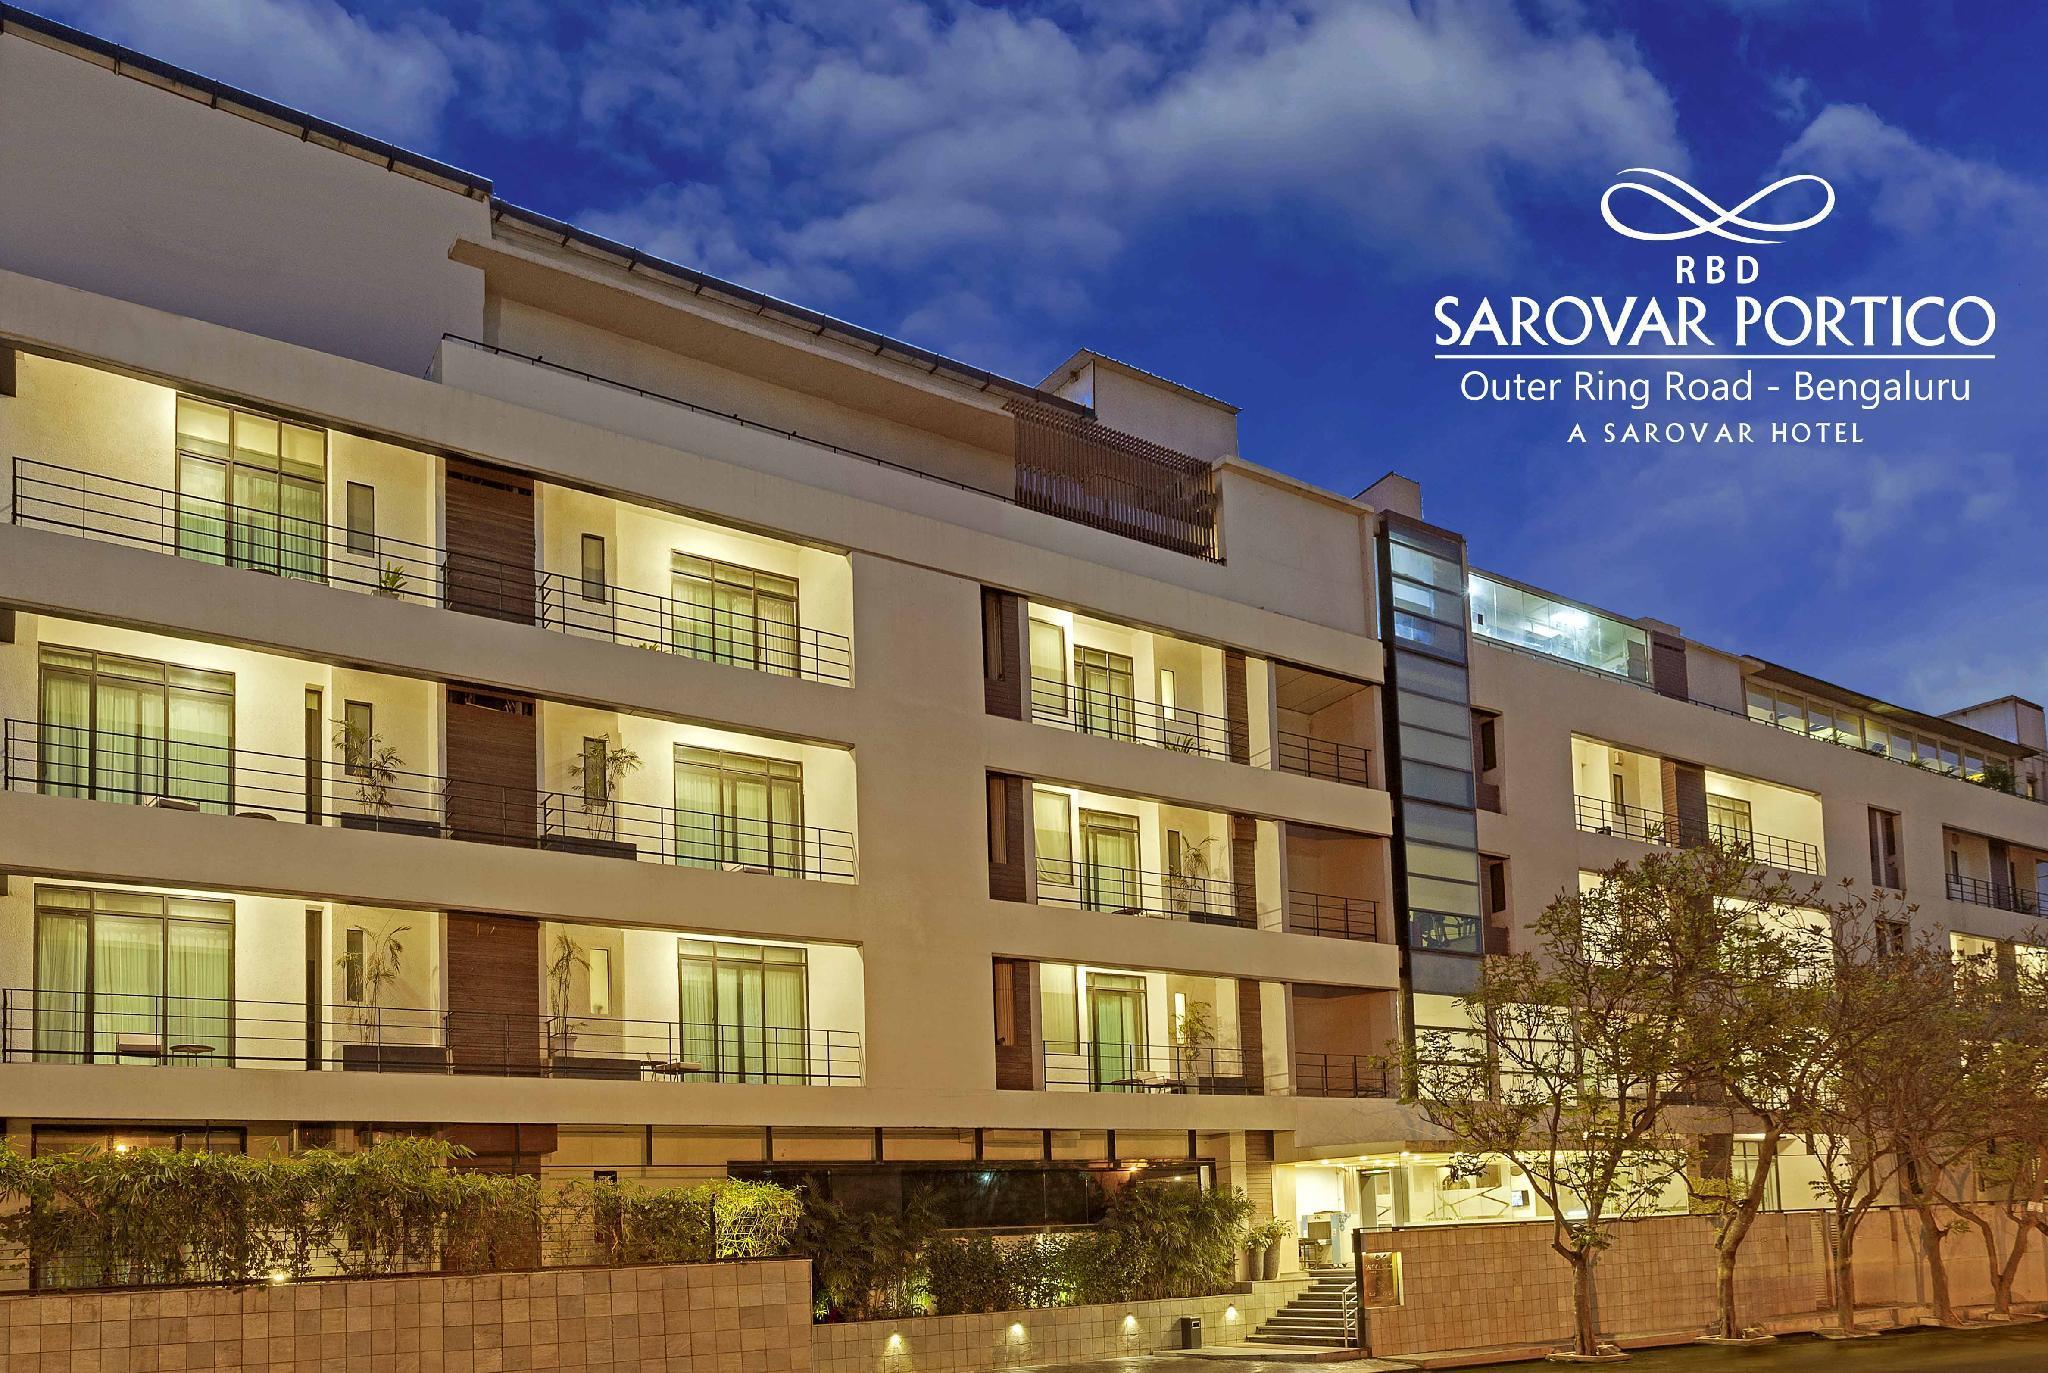 Sarovar Portico Outer Ring Road Bengaluru